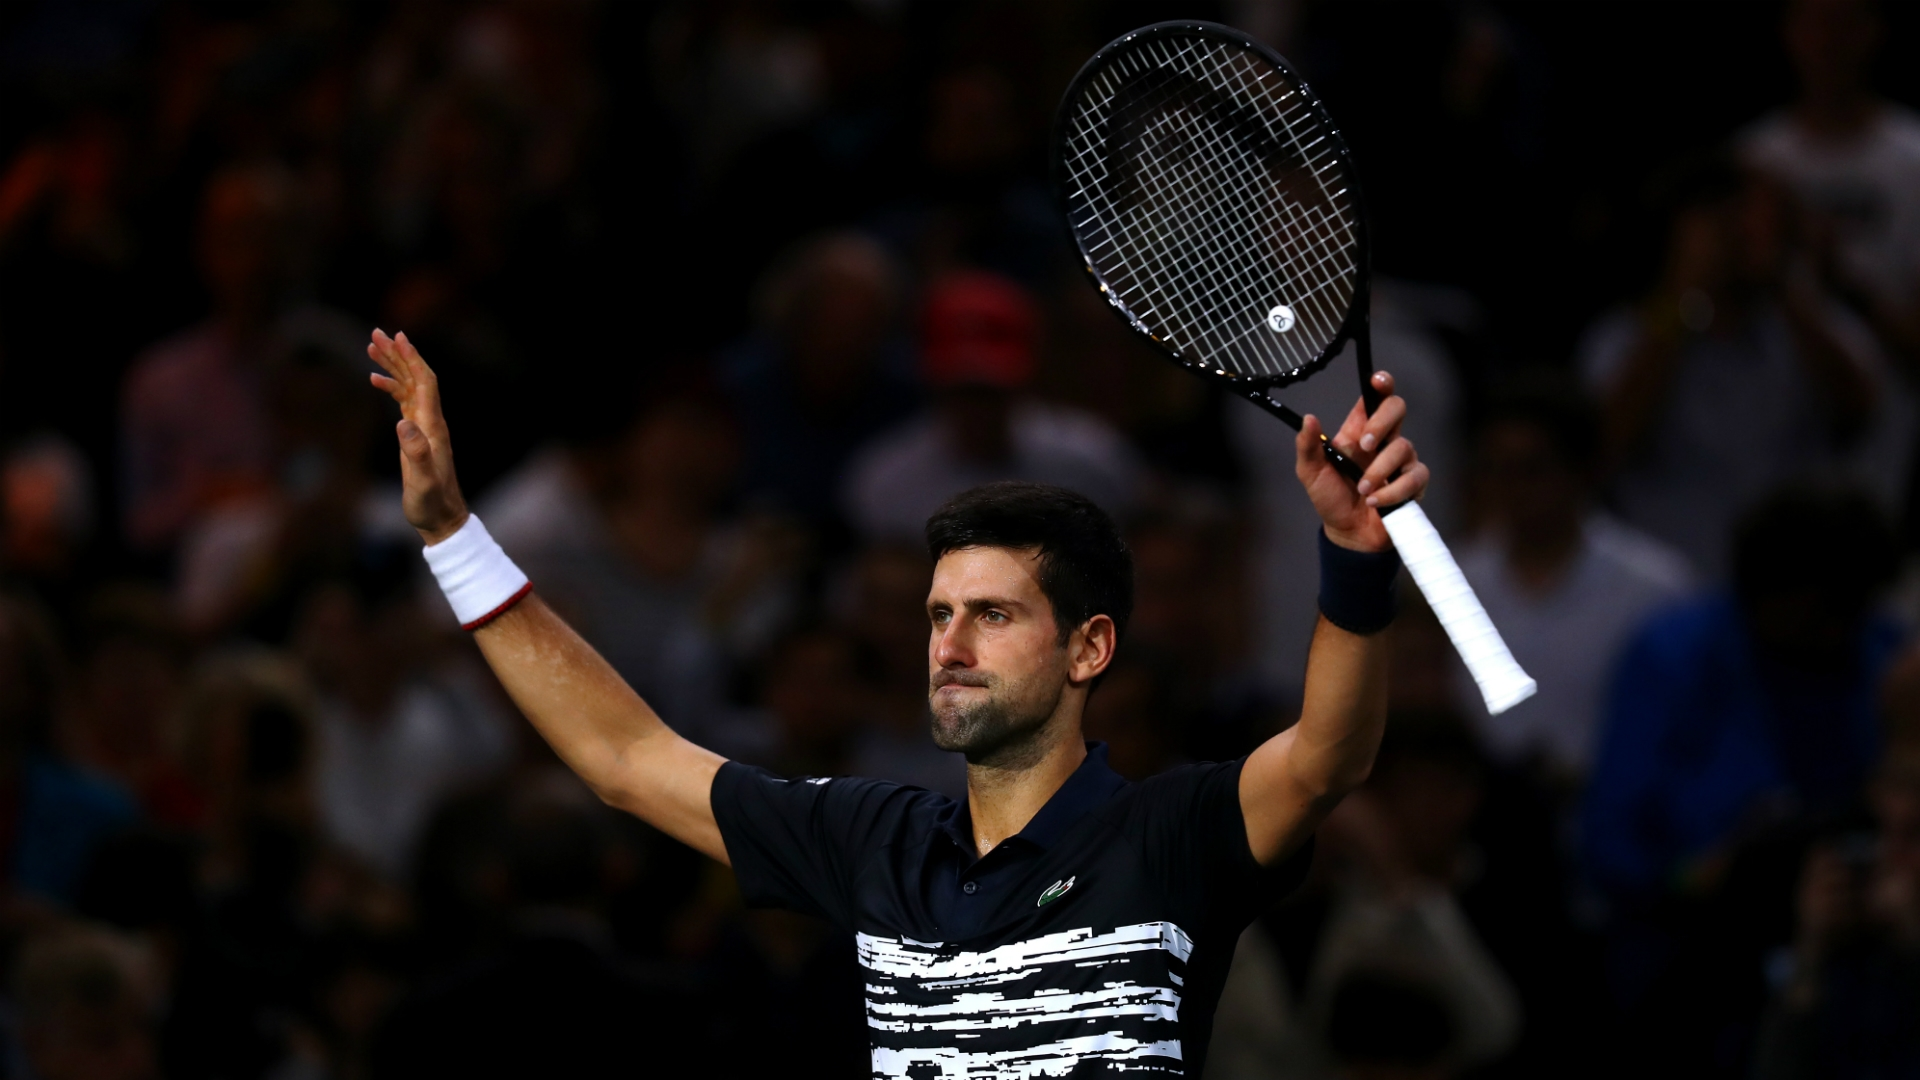 Denis Shapovalov falls short of his first ATP Masters title, Djokovic wins Paris